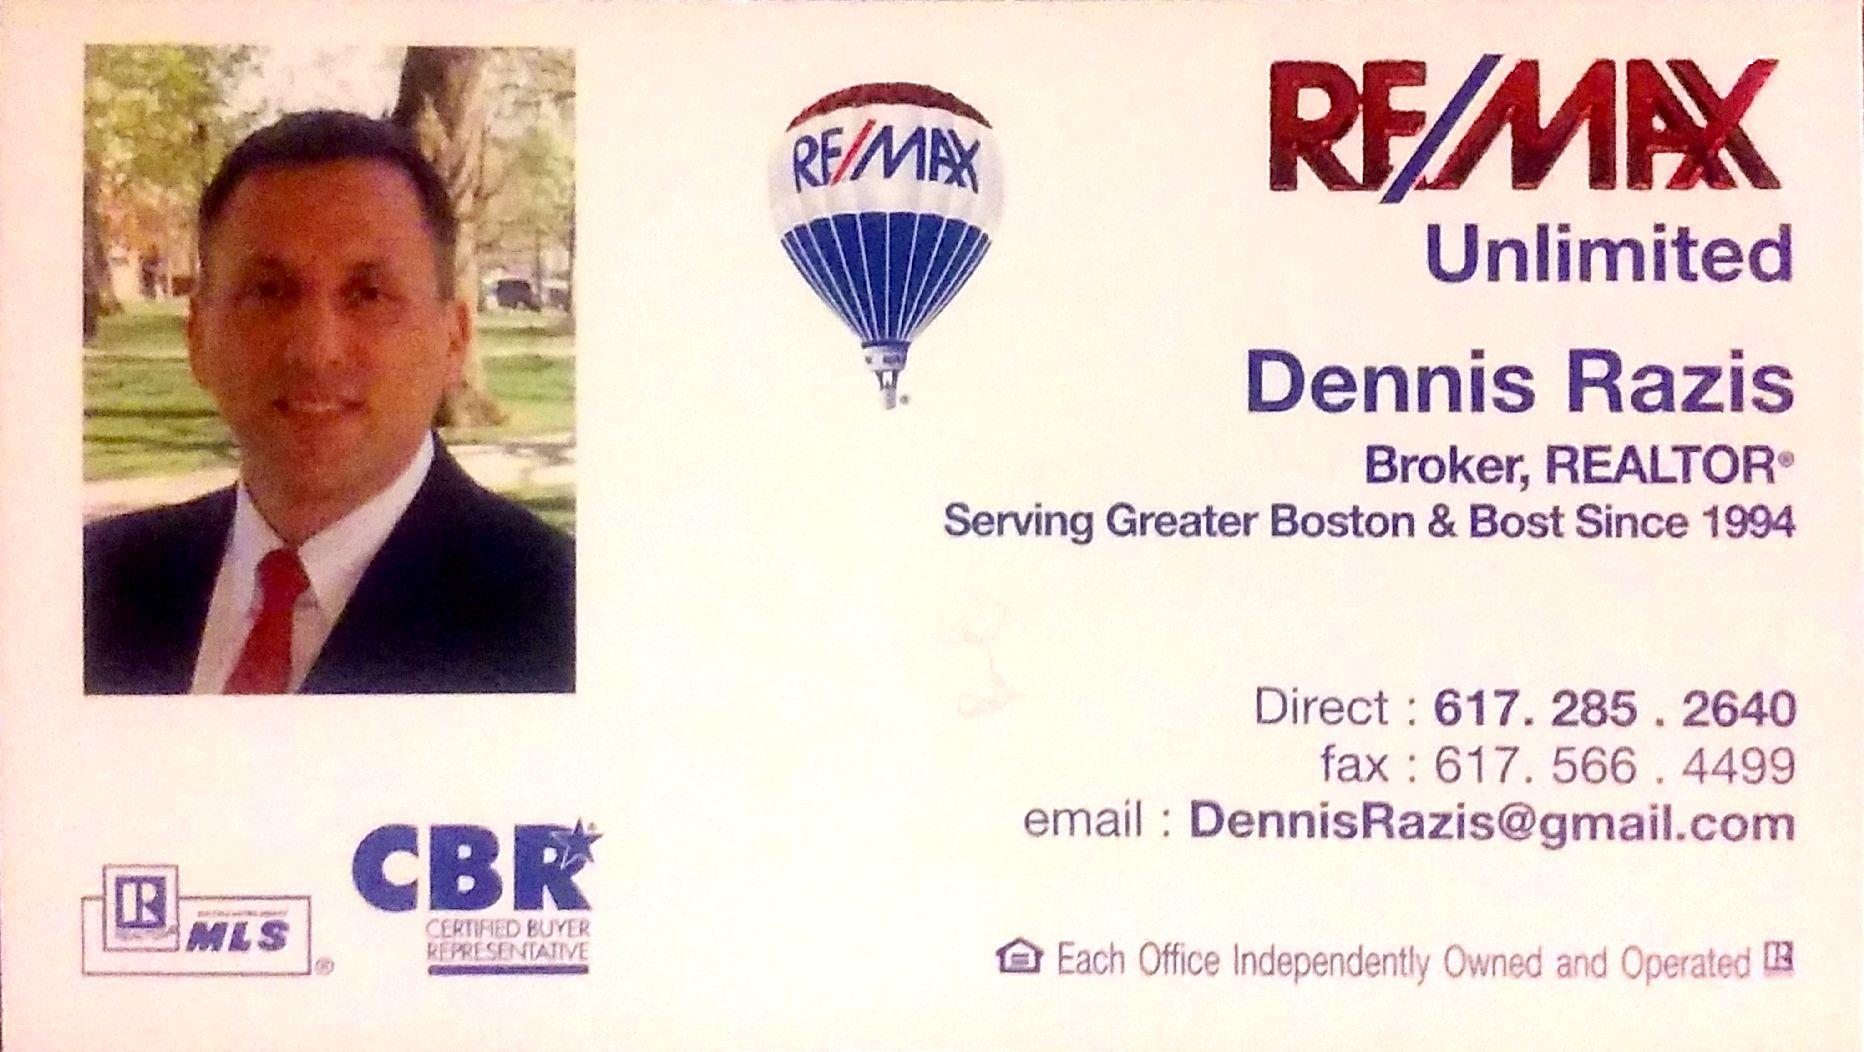 Dennis Razis, RE/MAX Unlimited, Brookline, MA